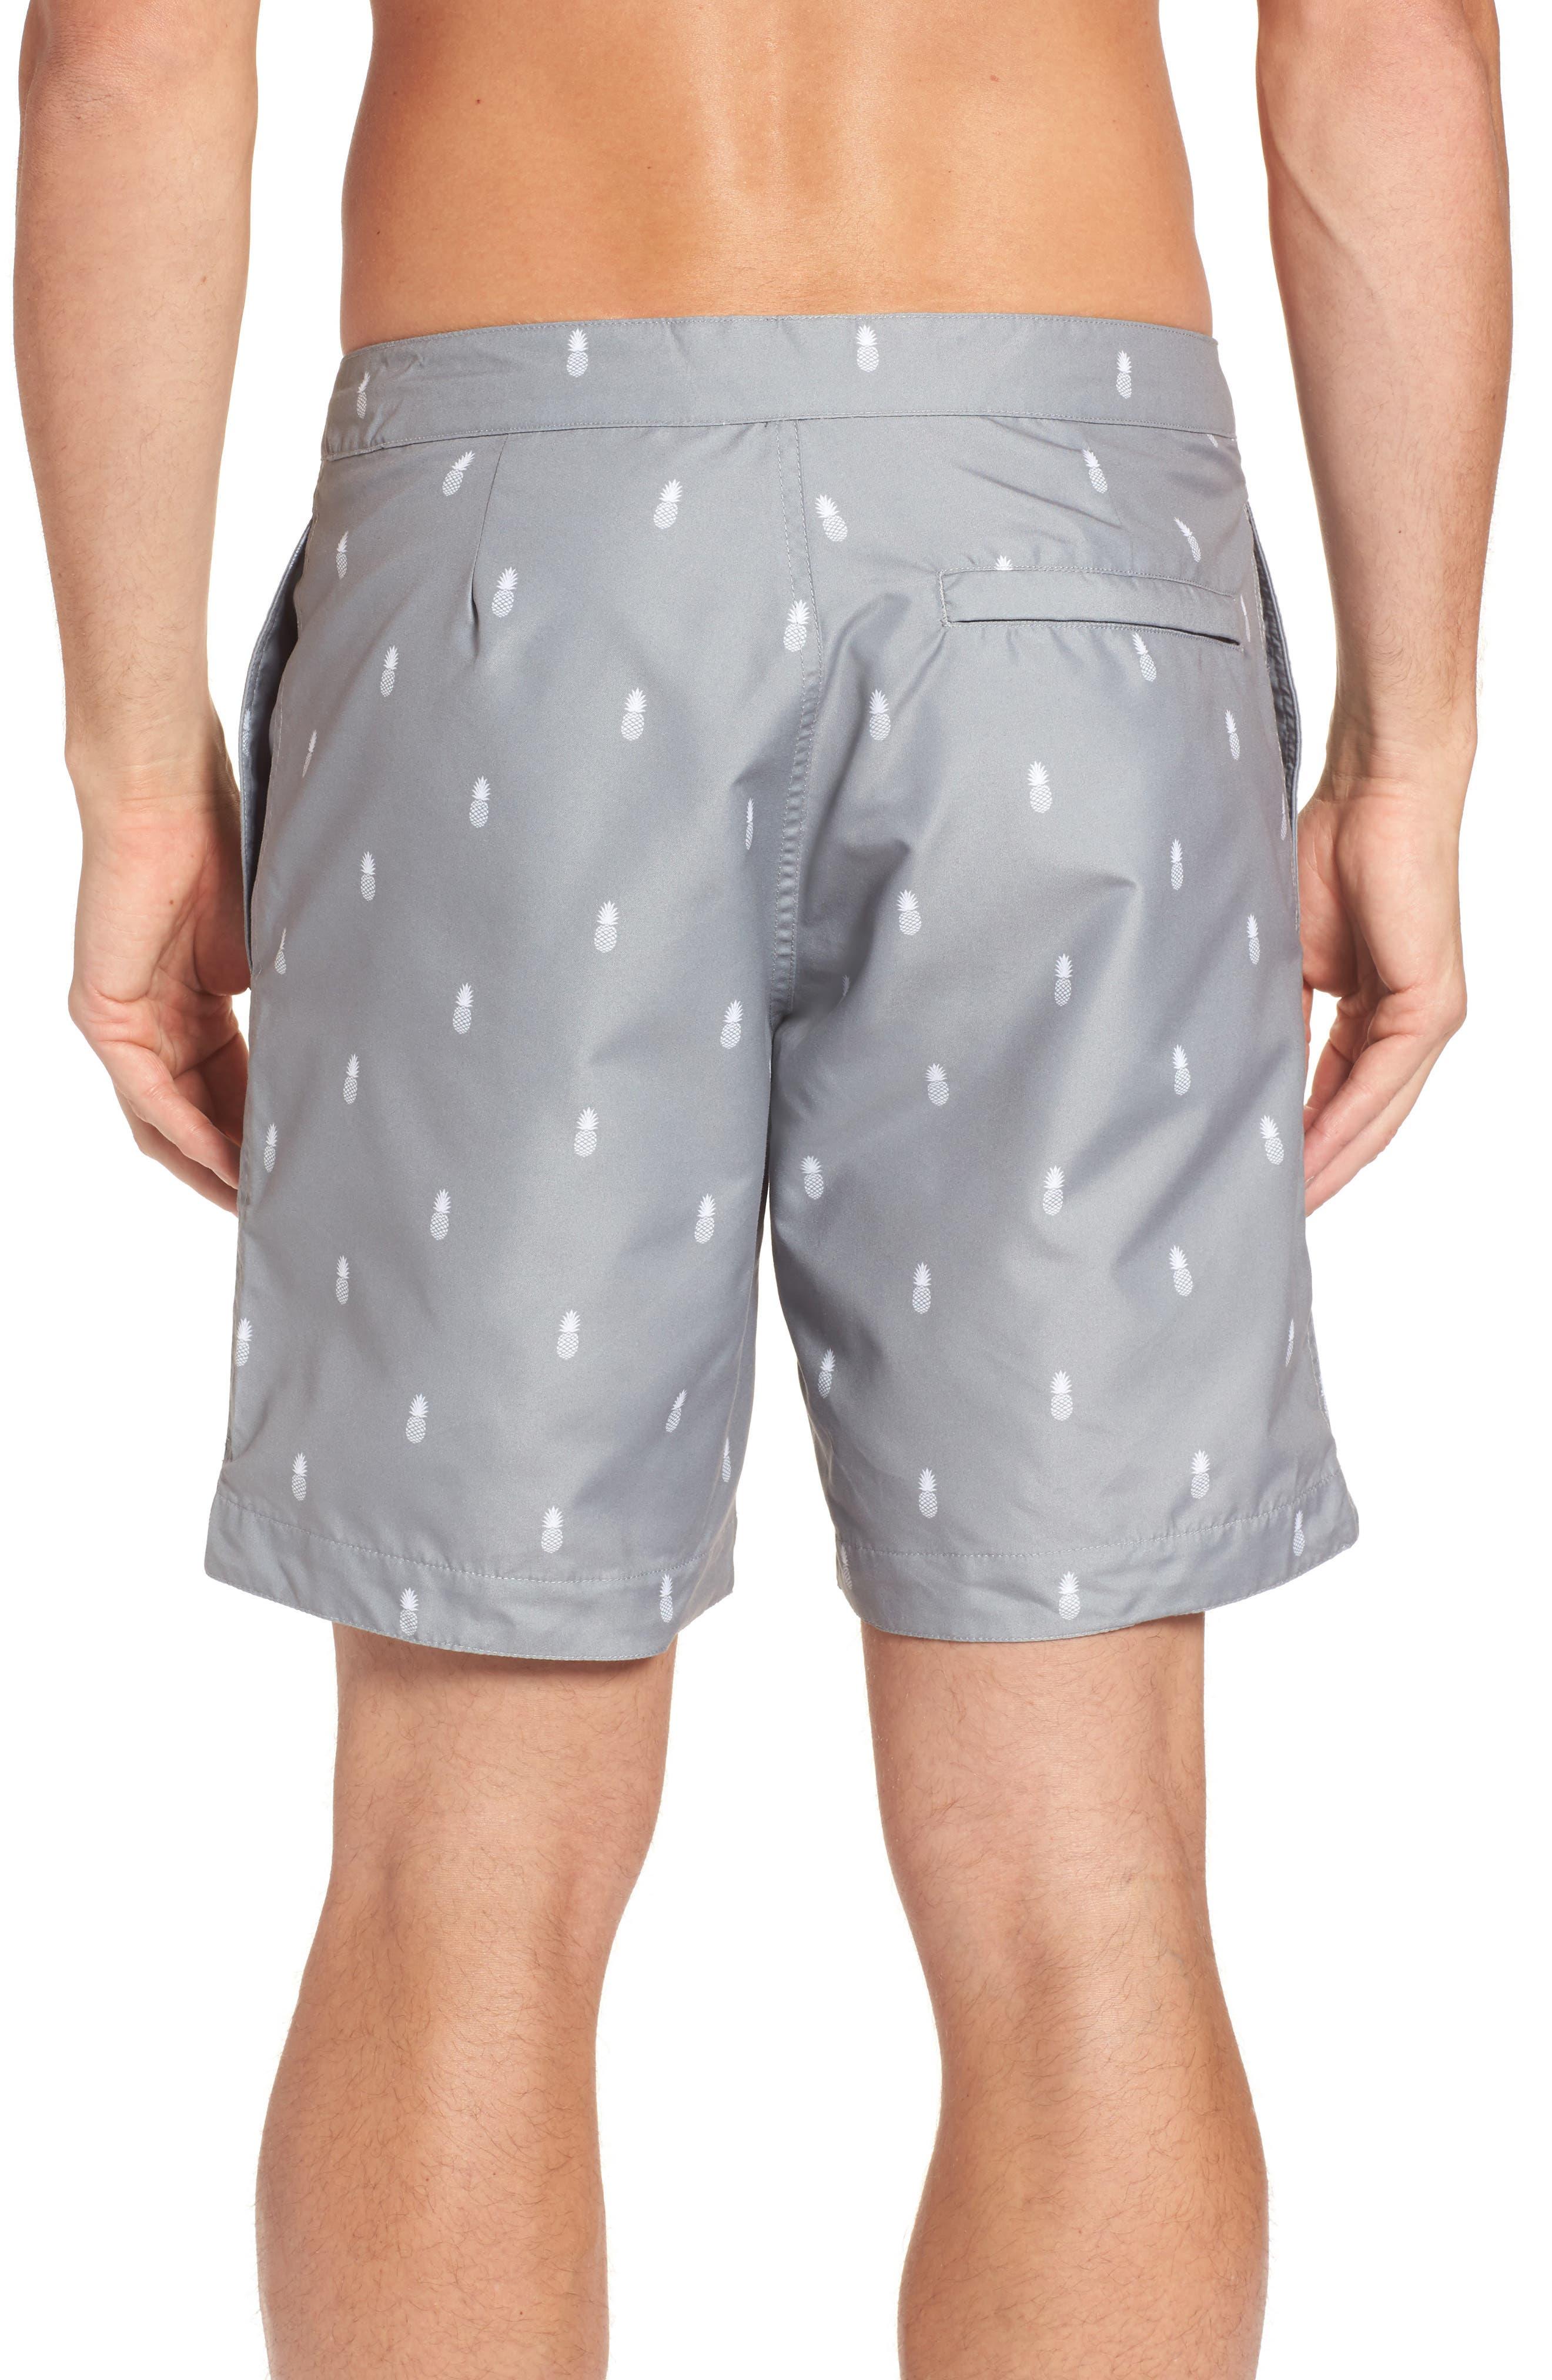 Alternate Image 2  - boto Aruba Tailored Fit Swim Trunks